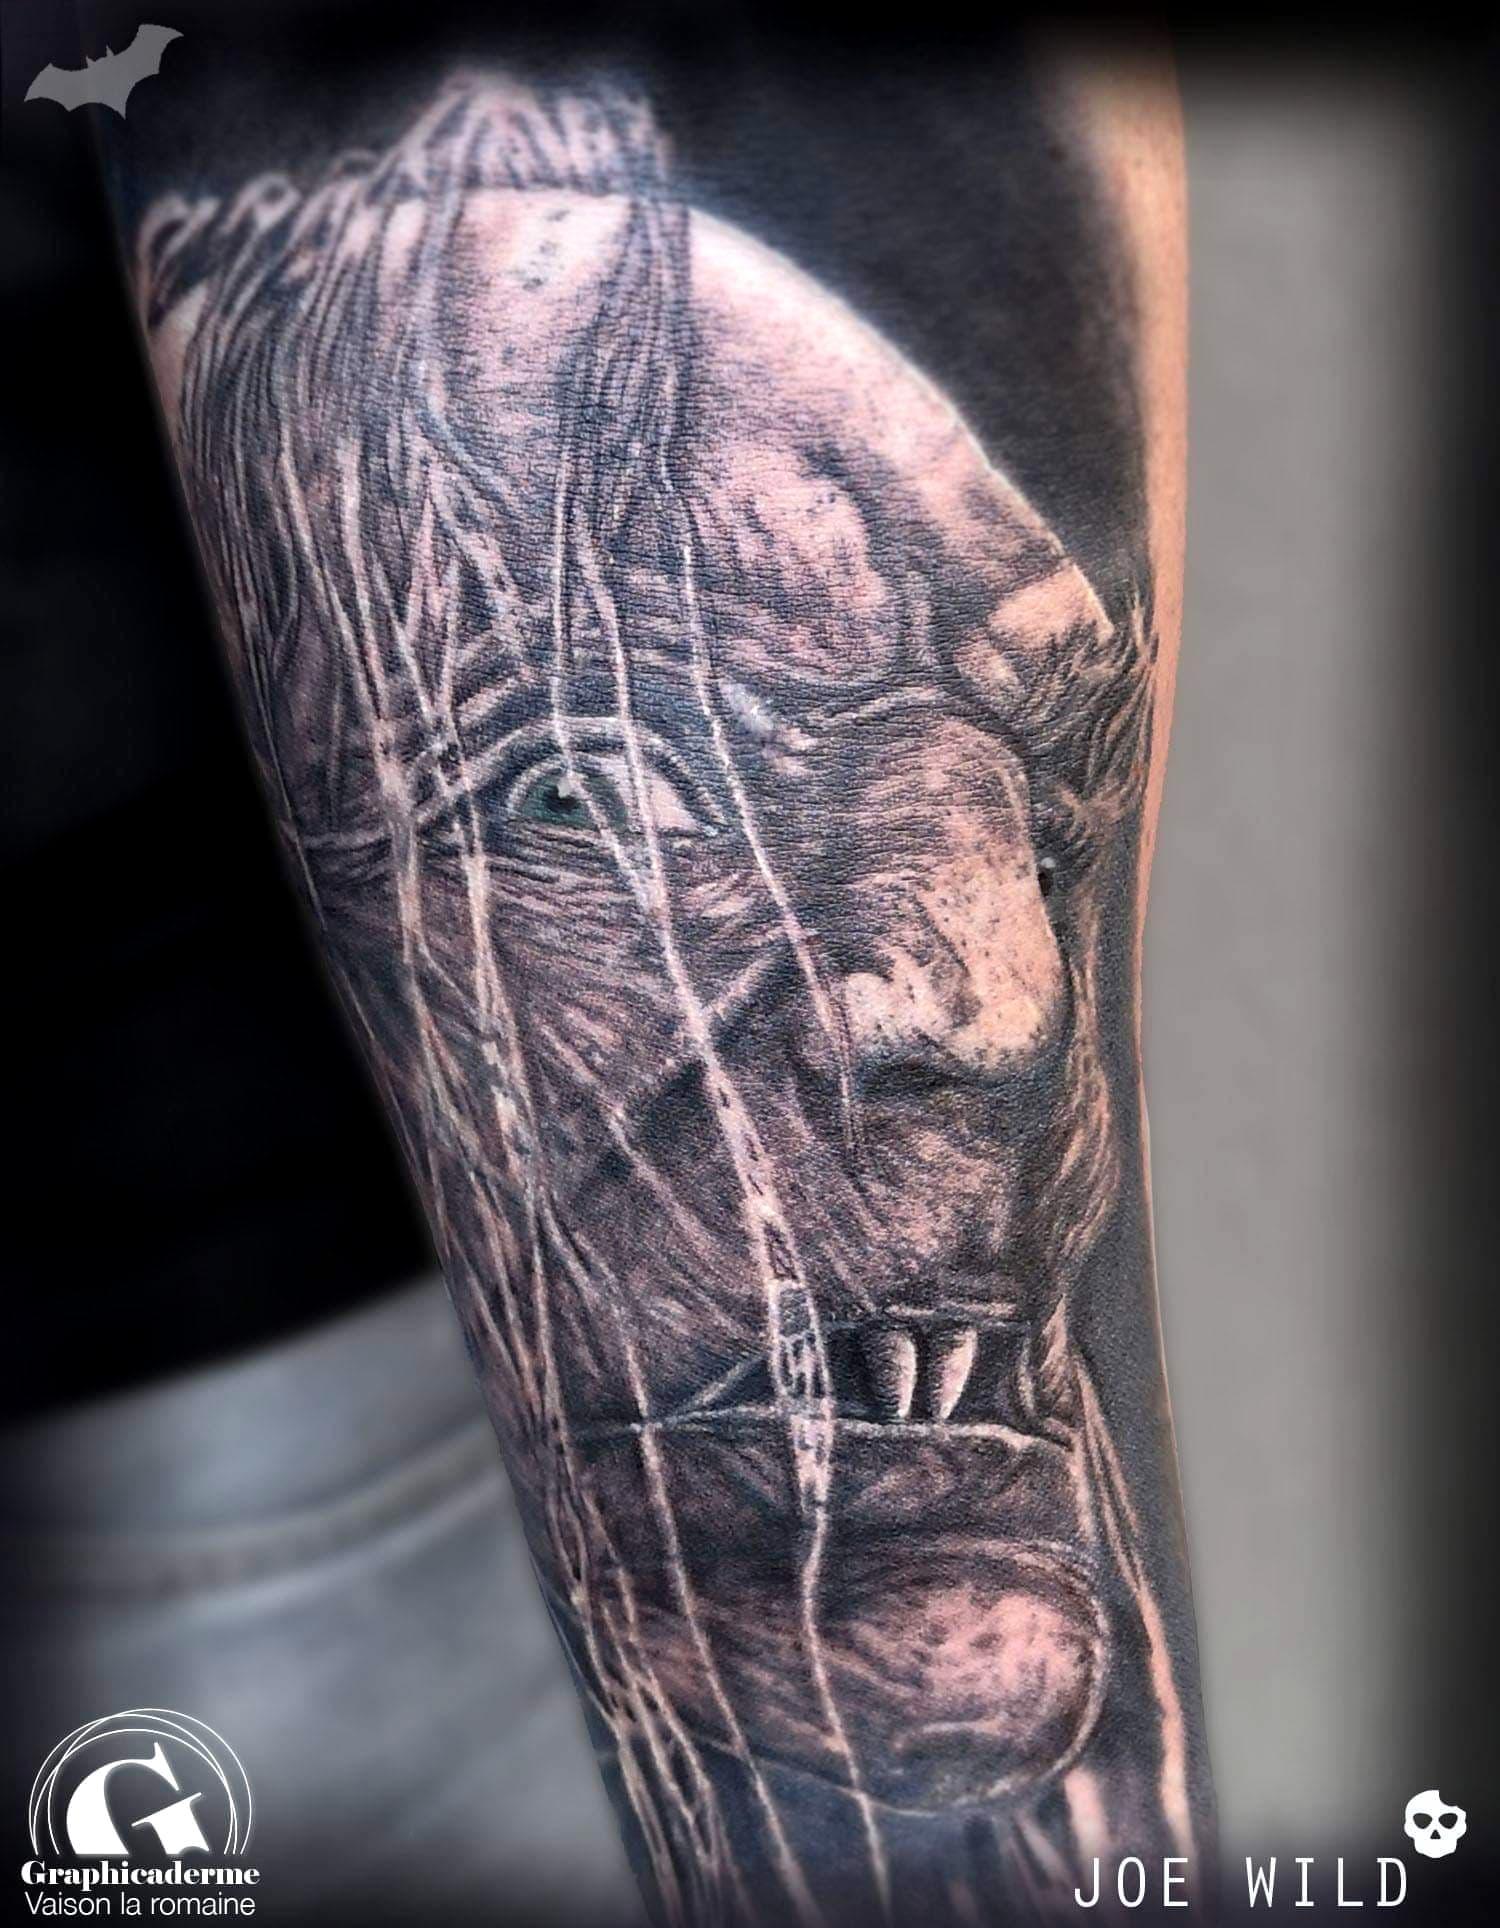 joe-wild-graphicaderme-tatouage-nosferatu-vampire-bollene-nyons-carpentras-valreas-malaucene.